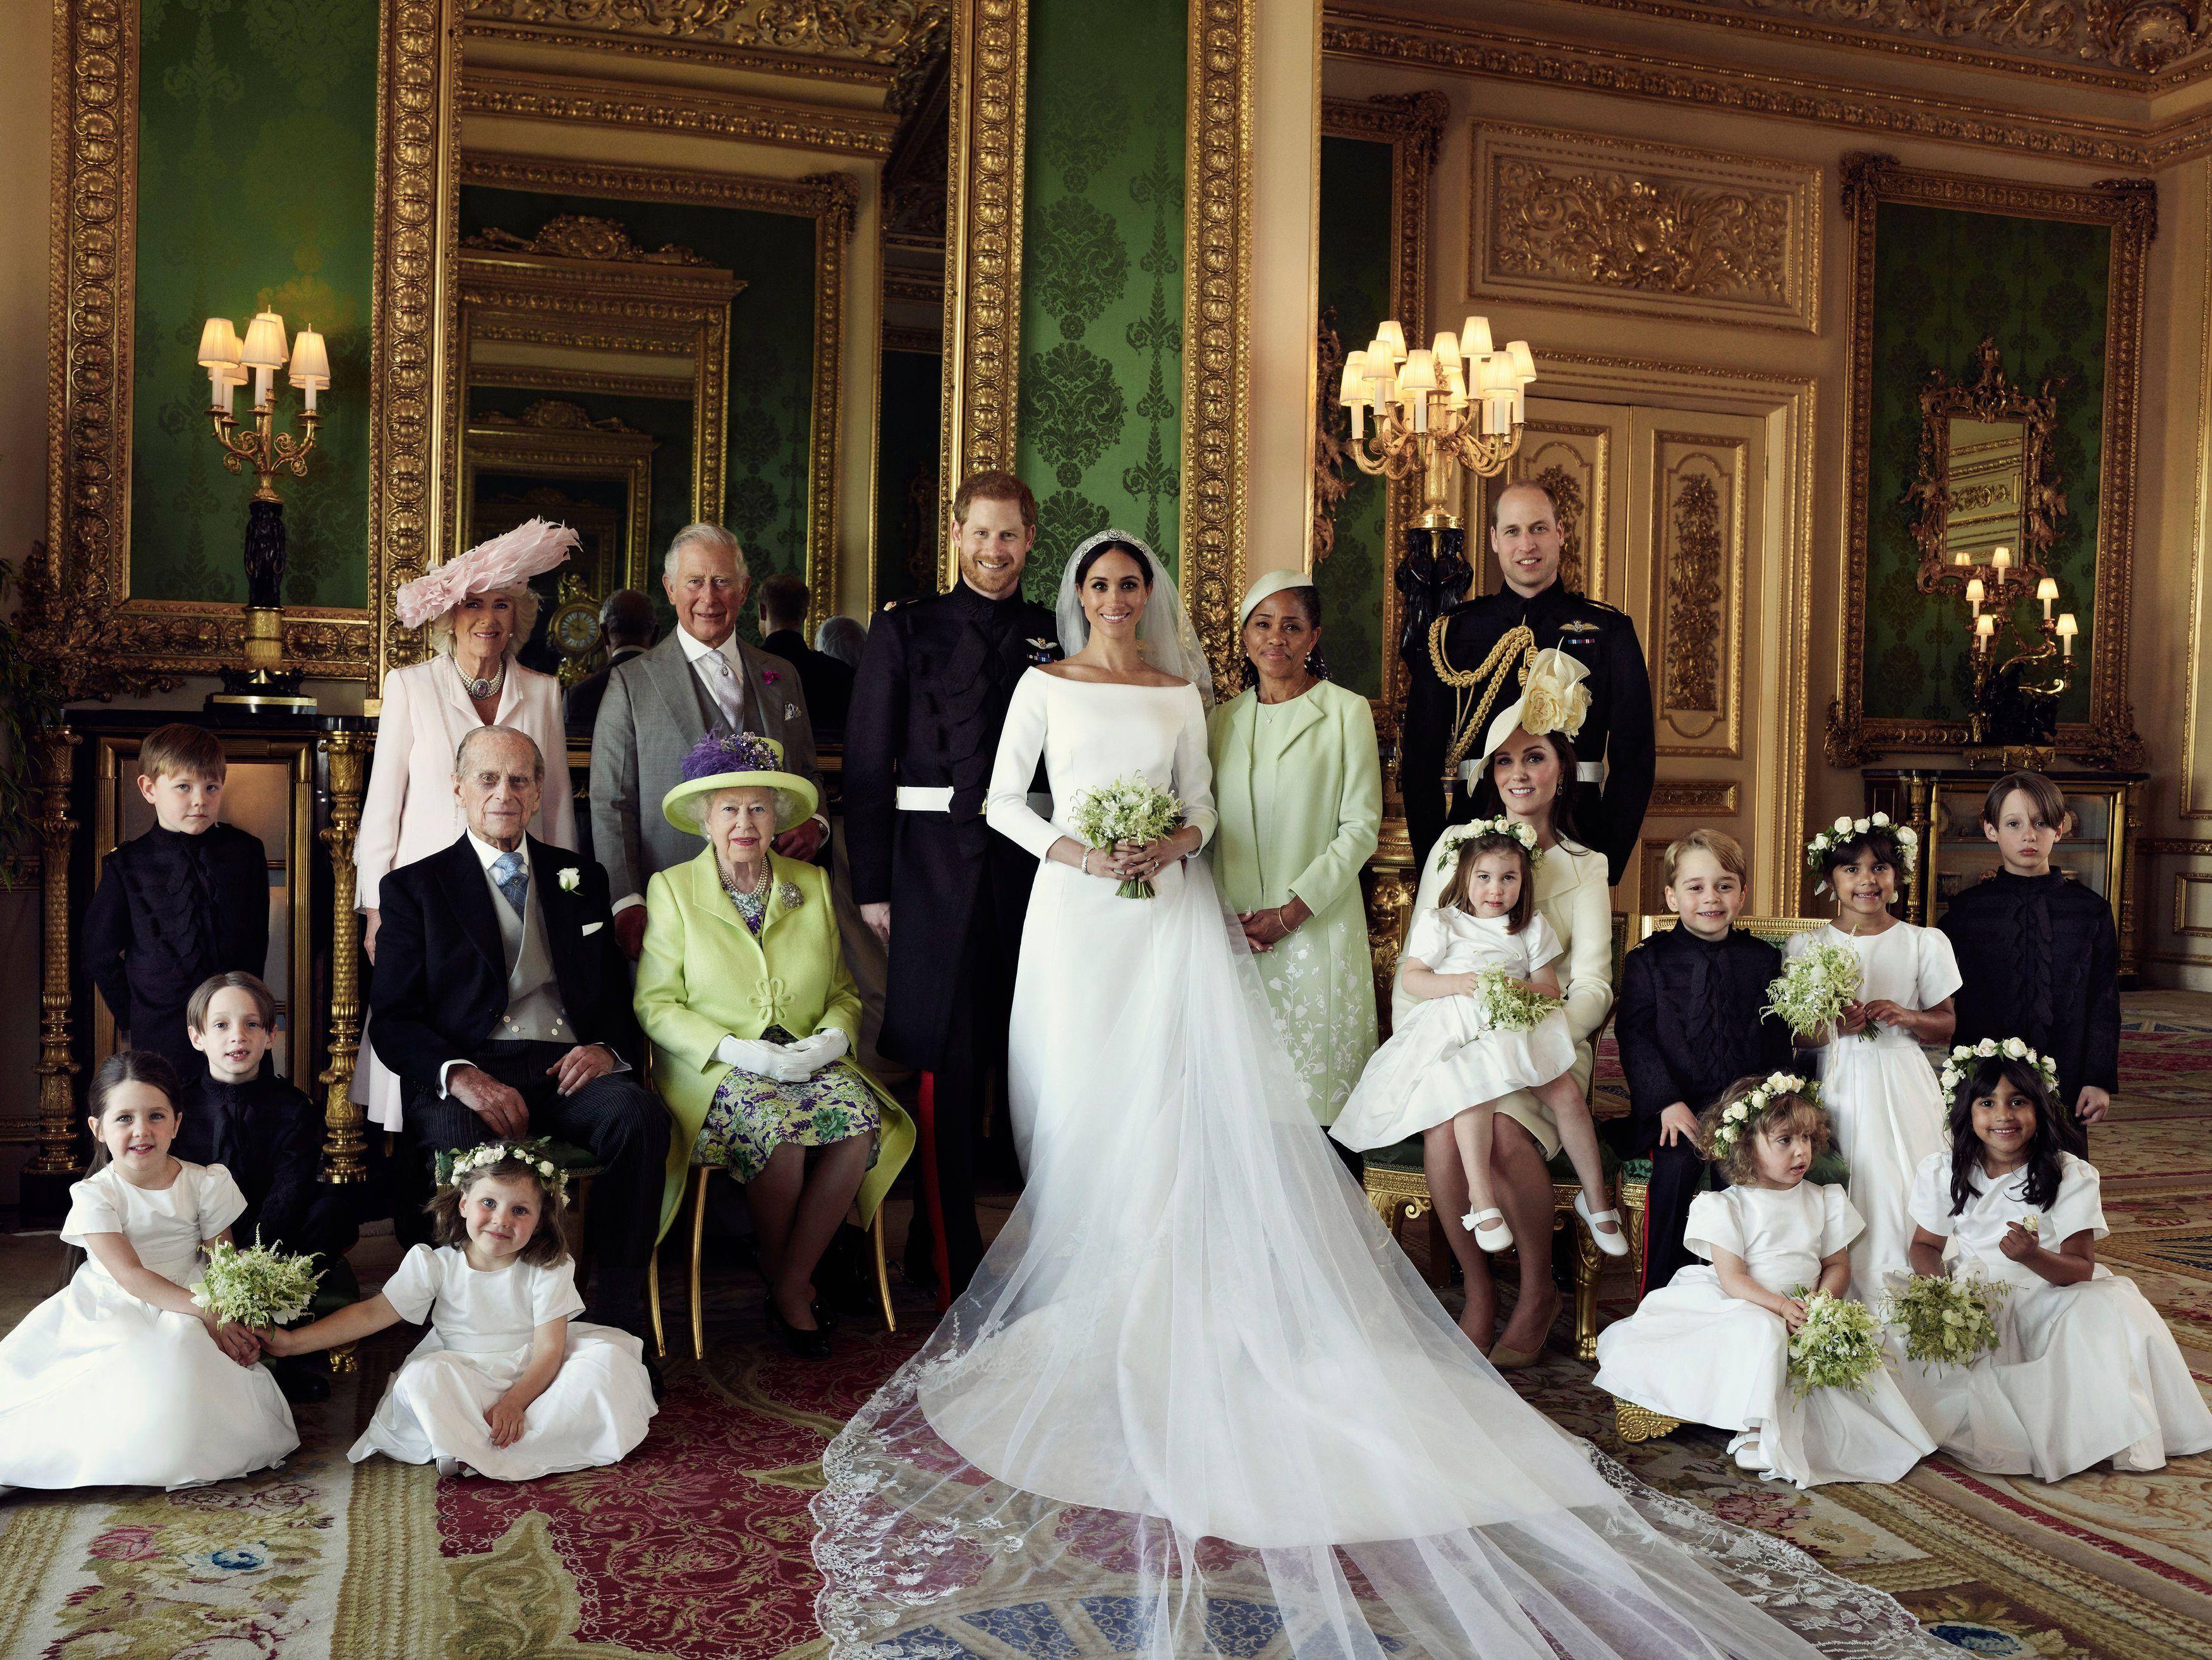 La Reina Isabel De Inglaterra Cumple 94 Anos